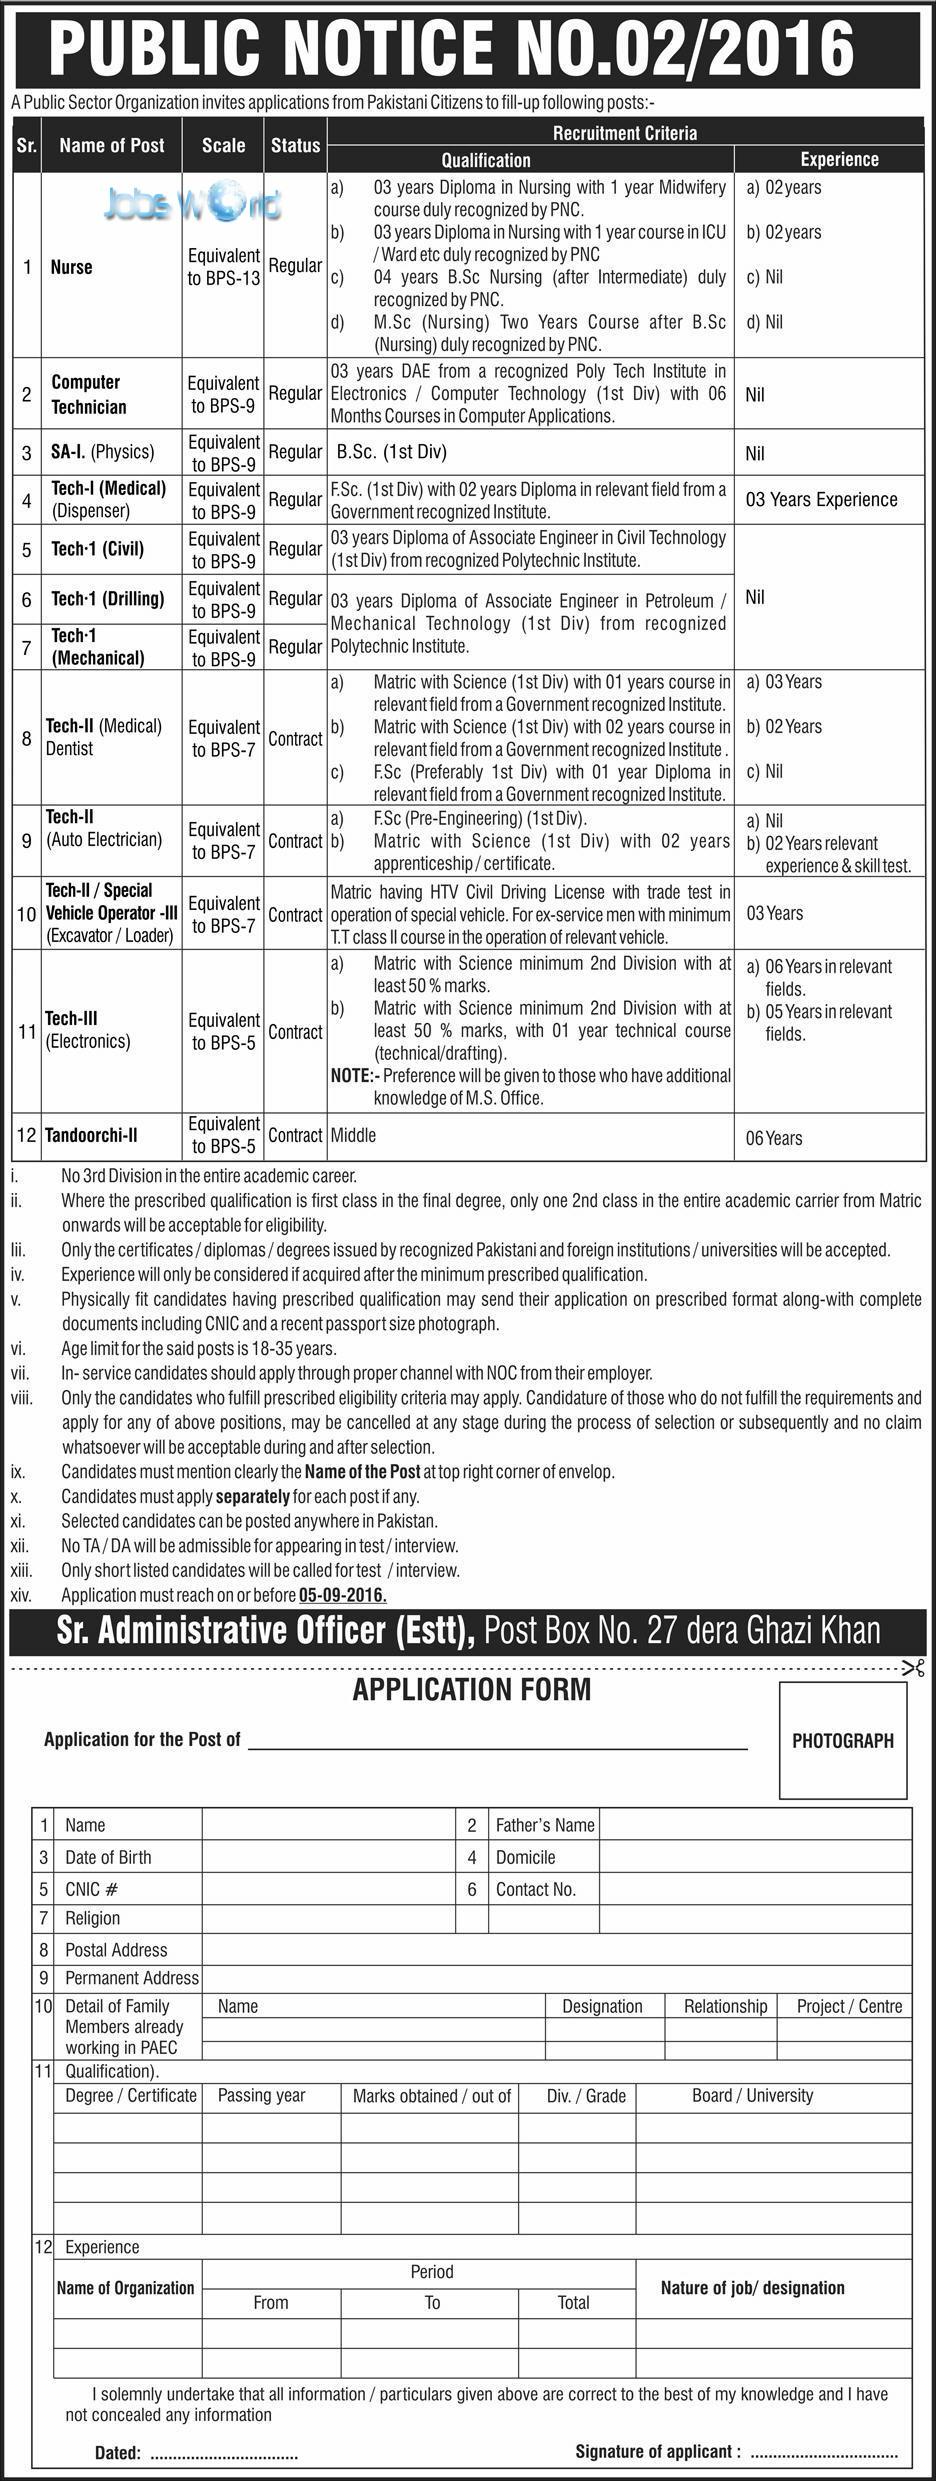 PO Box 27 Jobs 2016 Dera Ghazi Khan PAEC Application Form Download ...